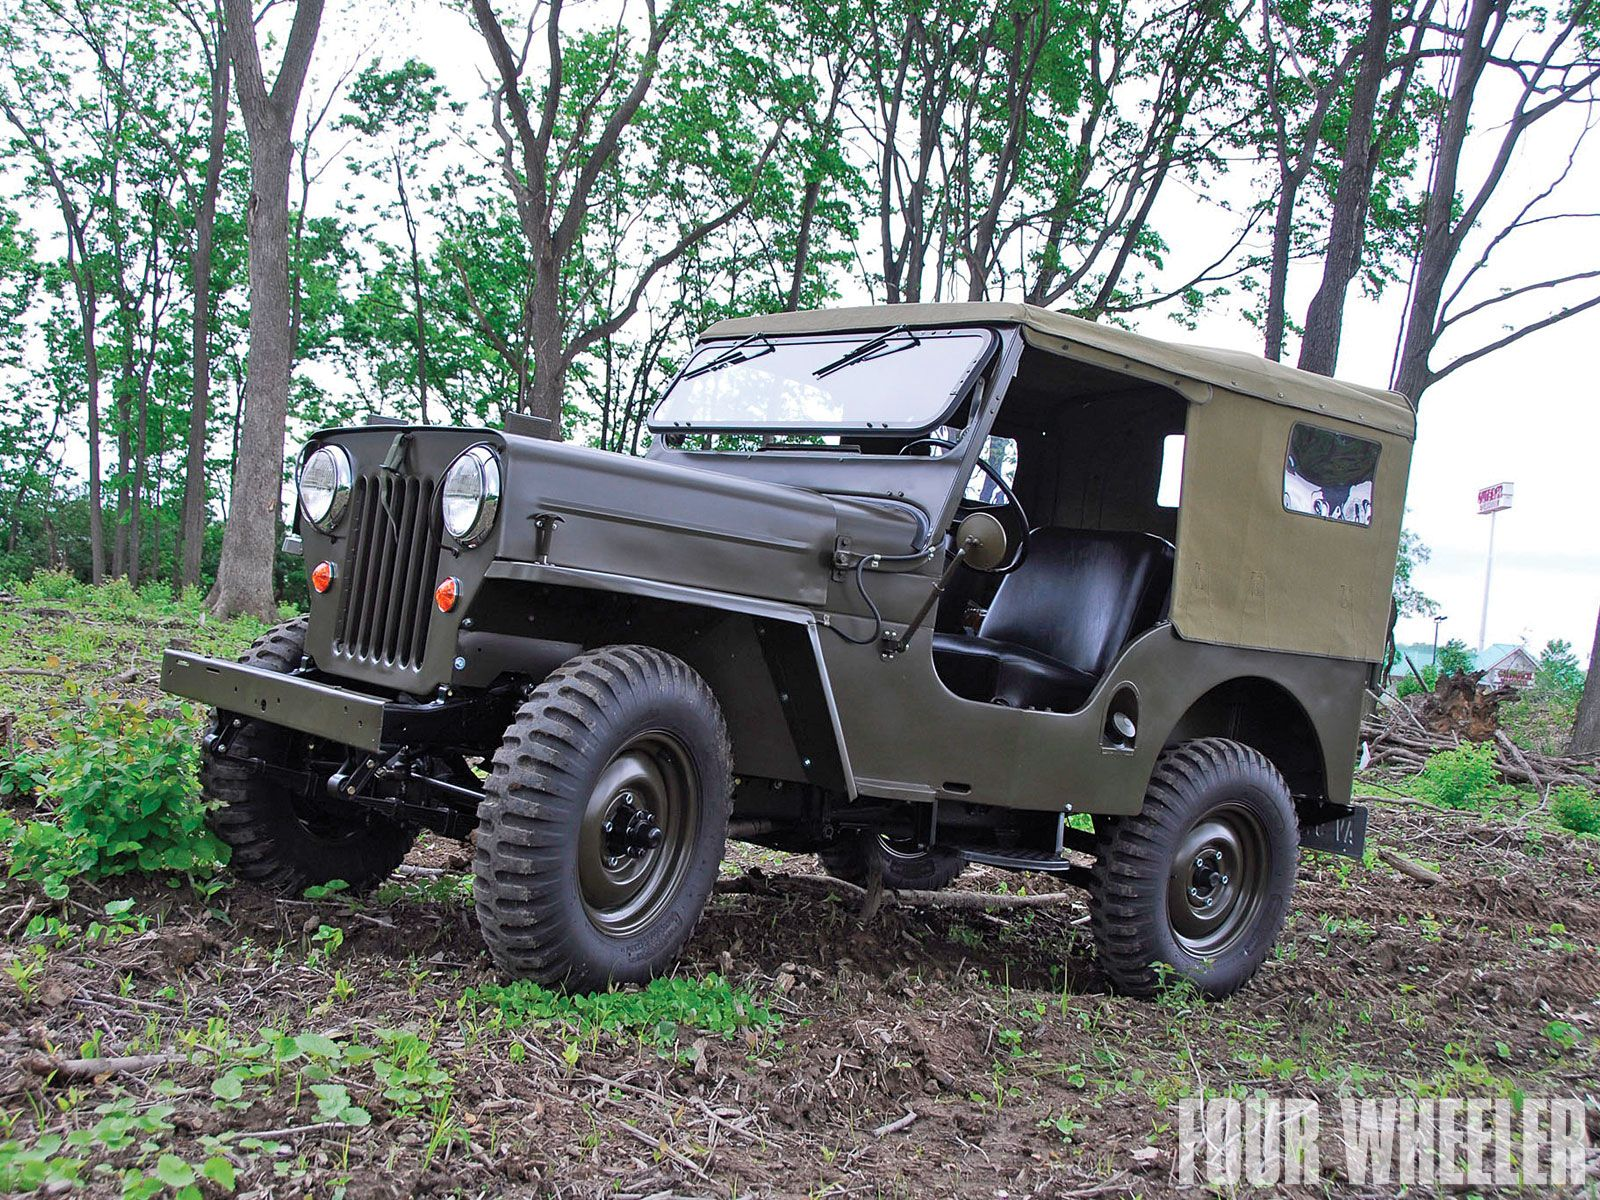 Pin By Francois Bourque On O O Jeep Cj Jeep Jeep Wallpaper